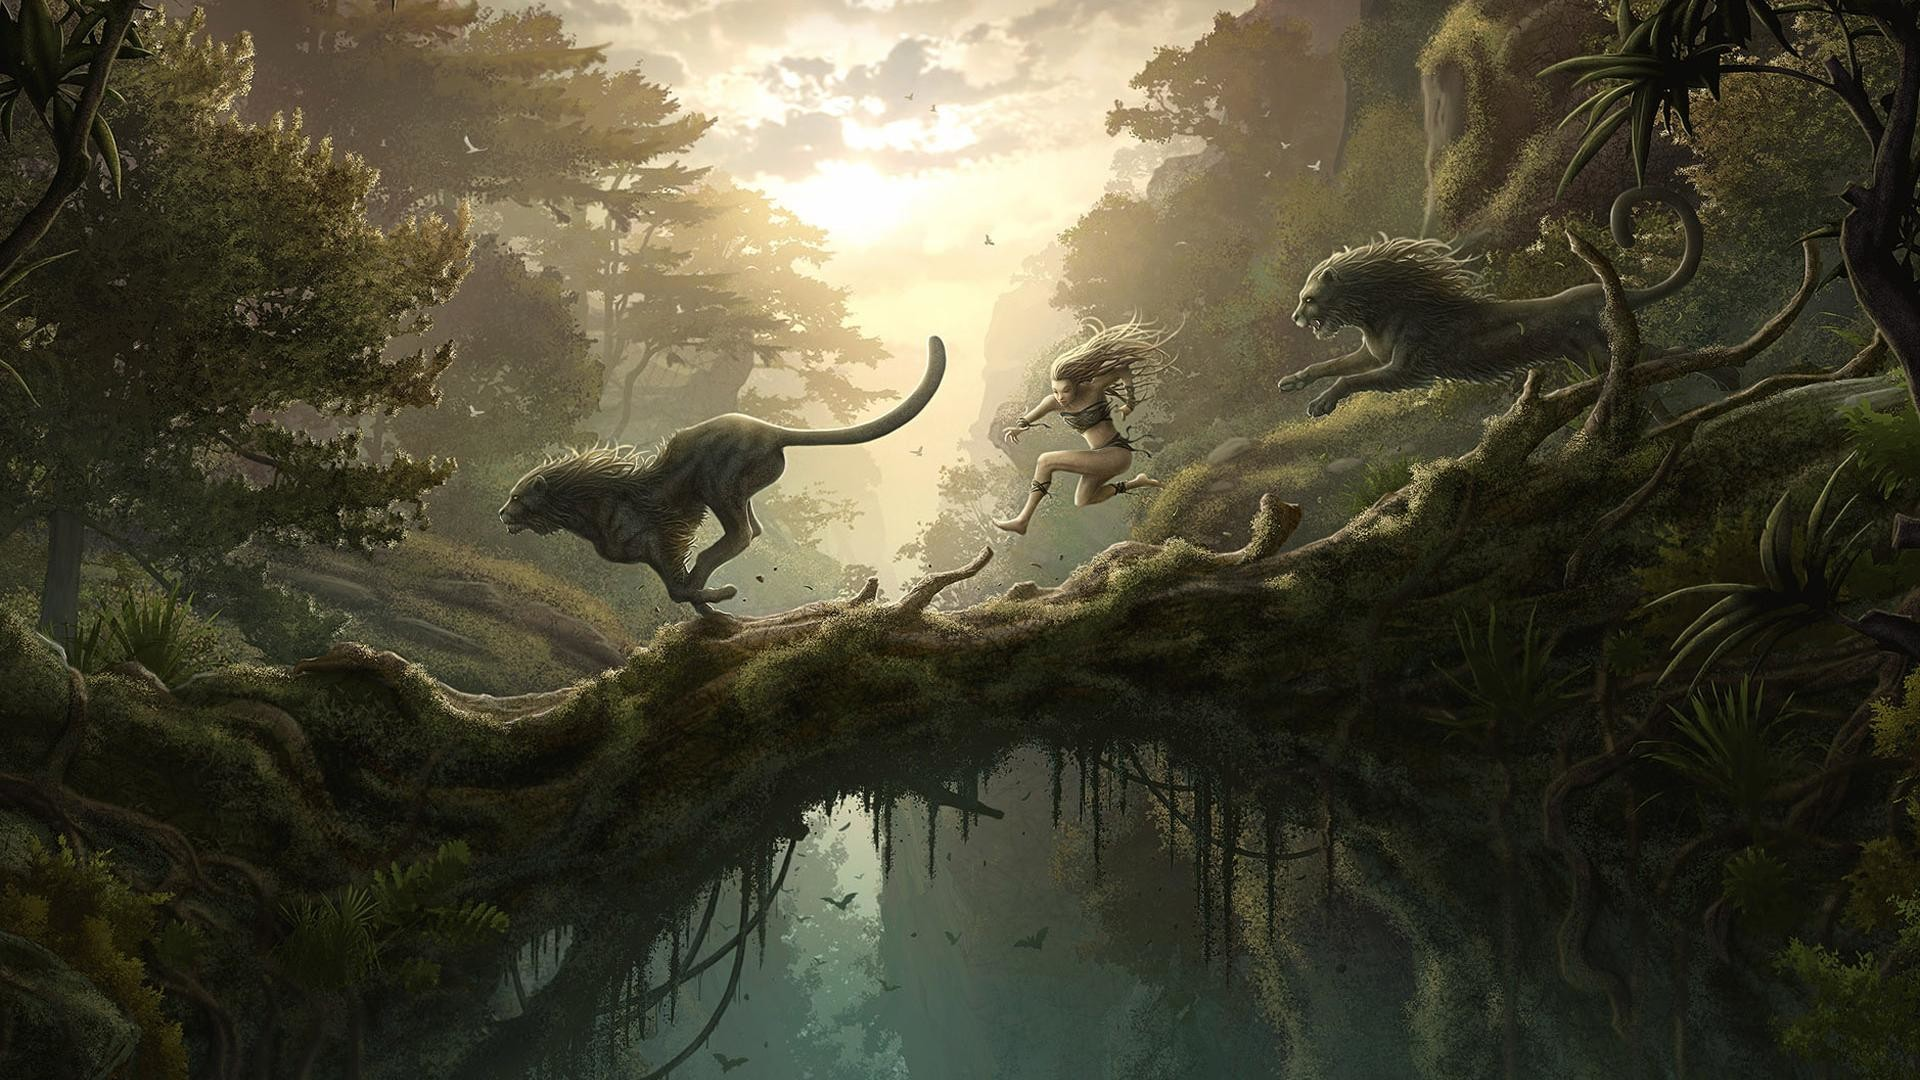 … cute dinosaur hd wallpaper best image dinosaur 2017 …